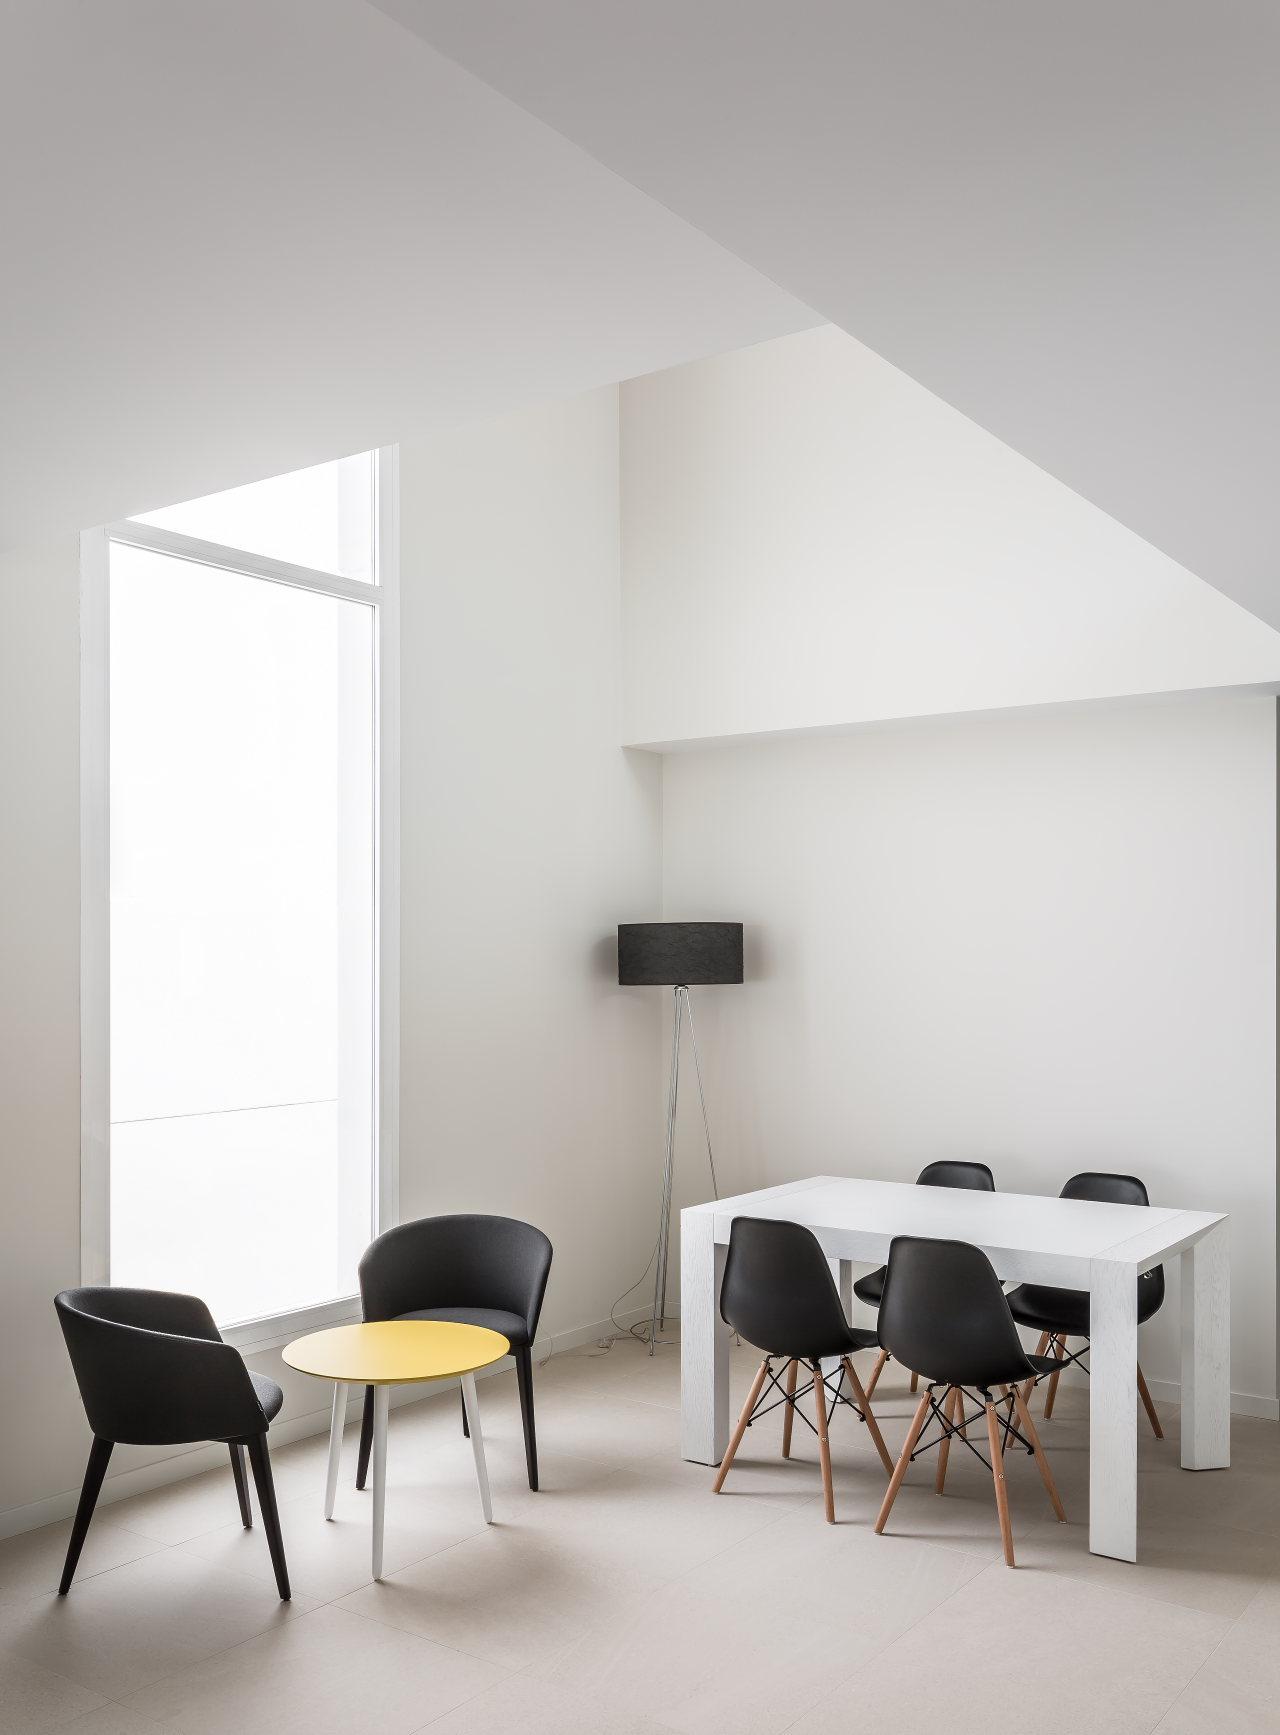 fotografia-arquitectura-valencia-german-cabo-viraje-san-antonio (17)